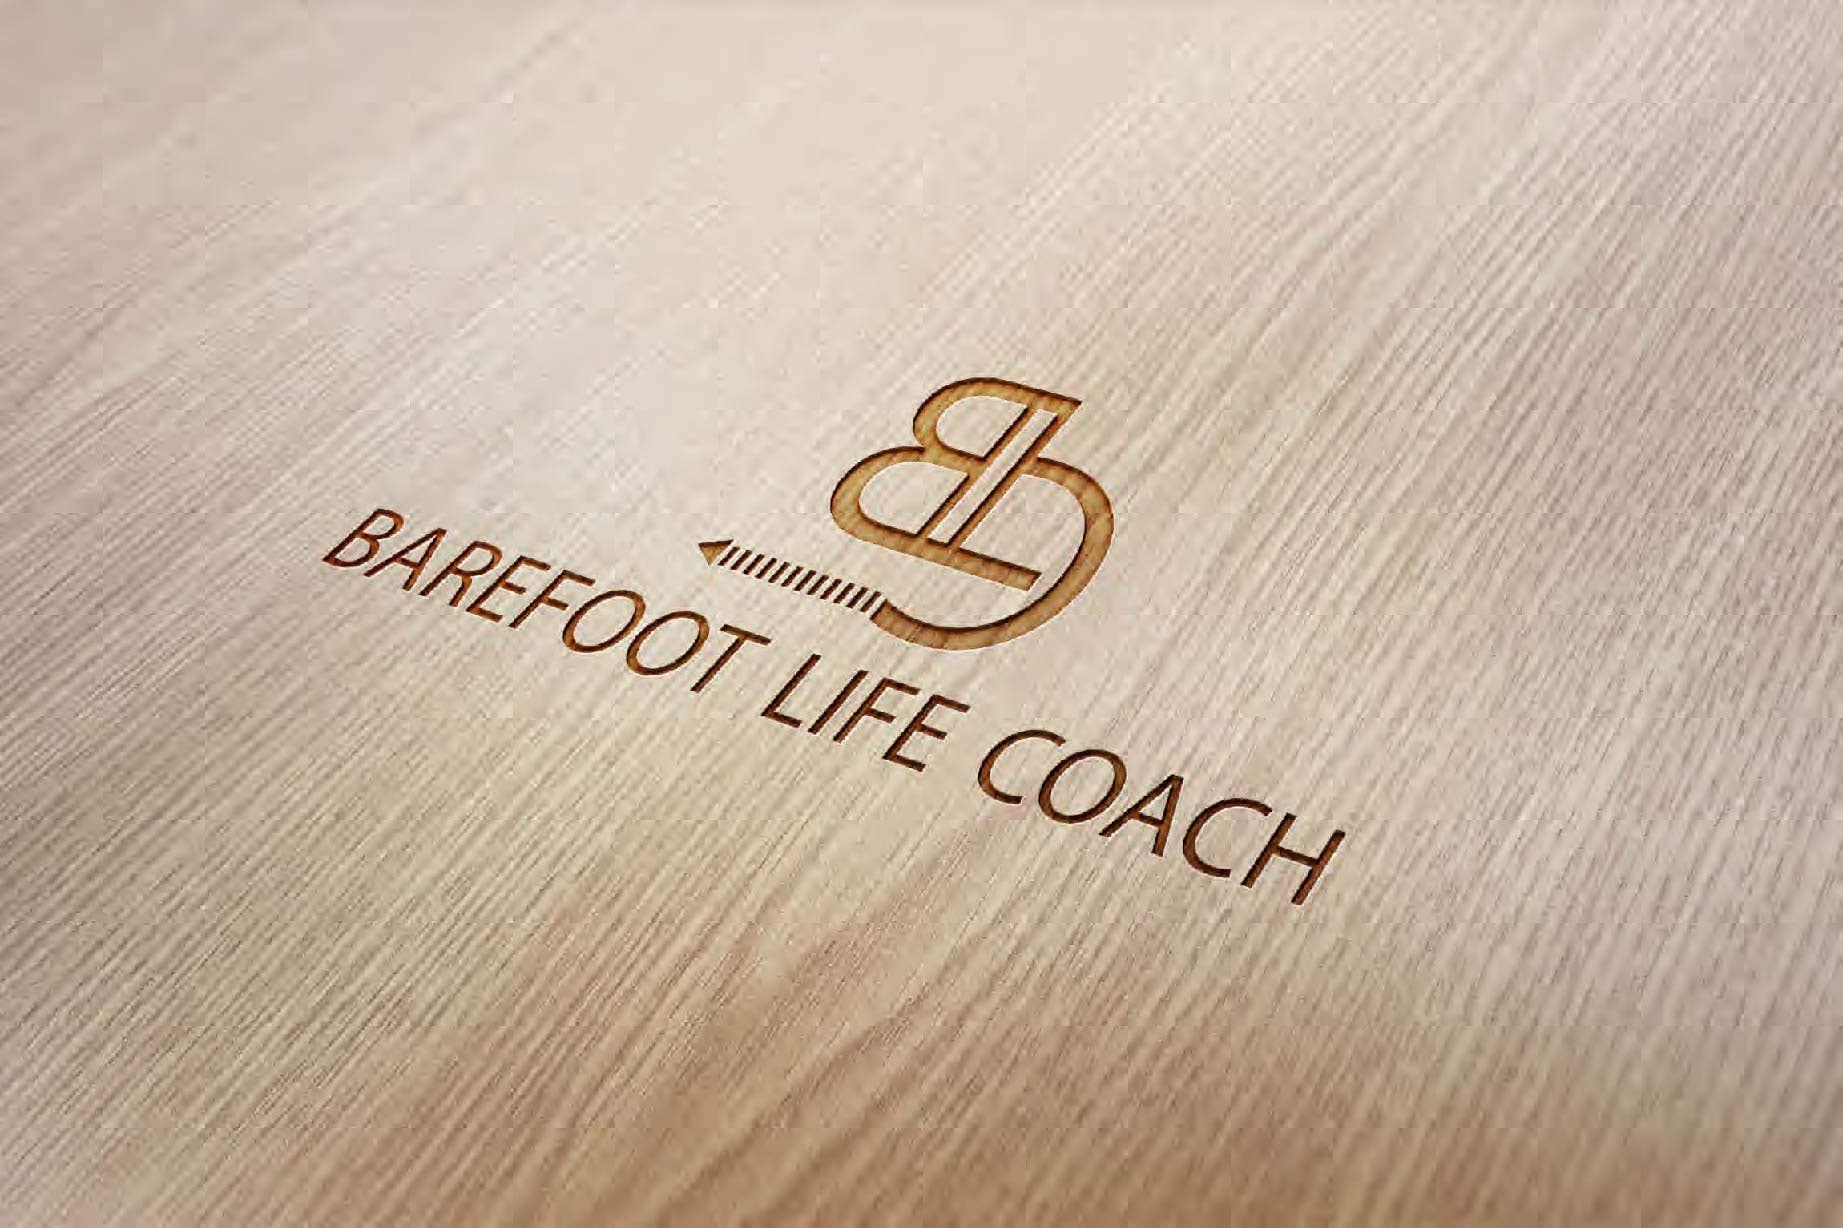 Barefoot Life Coach - LOGO